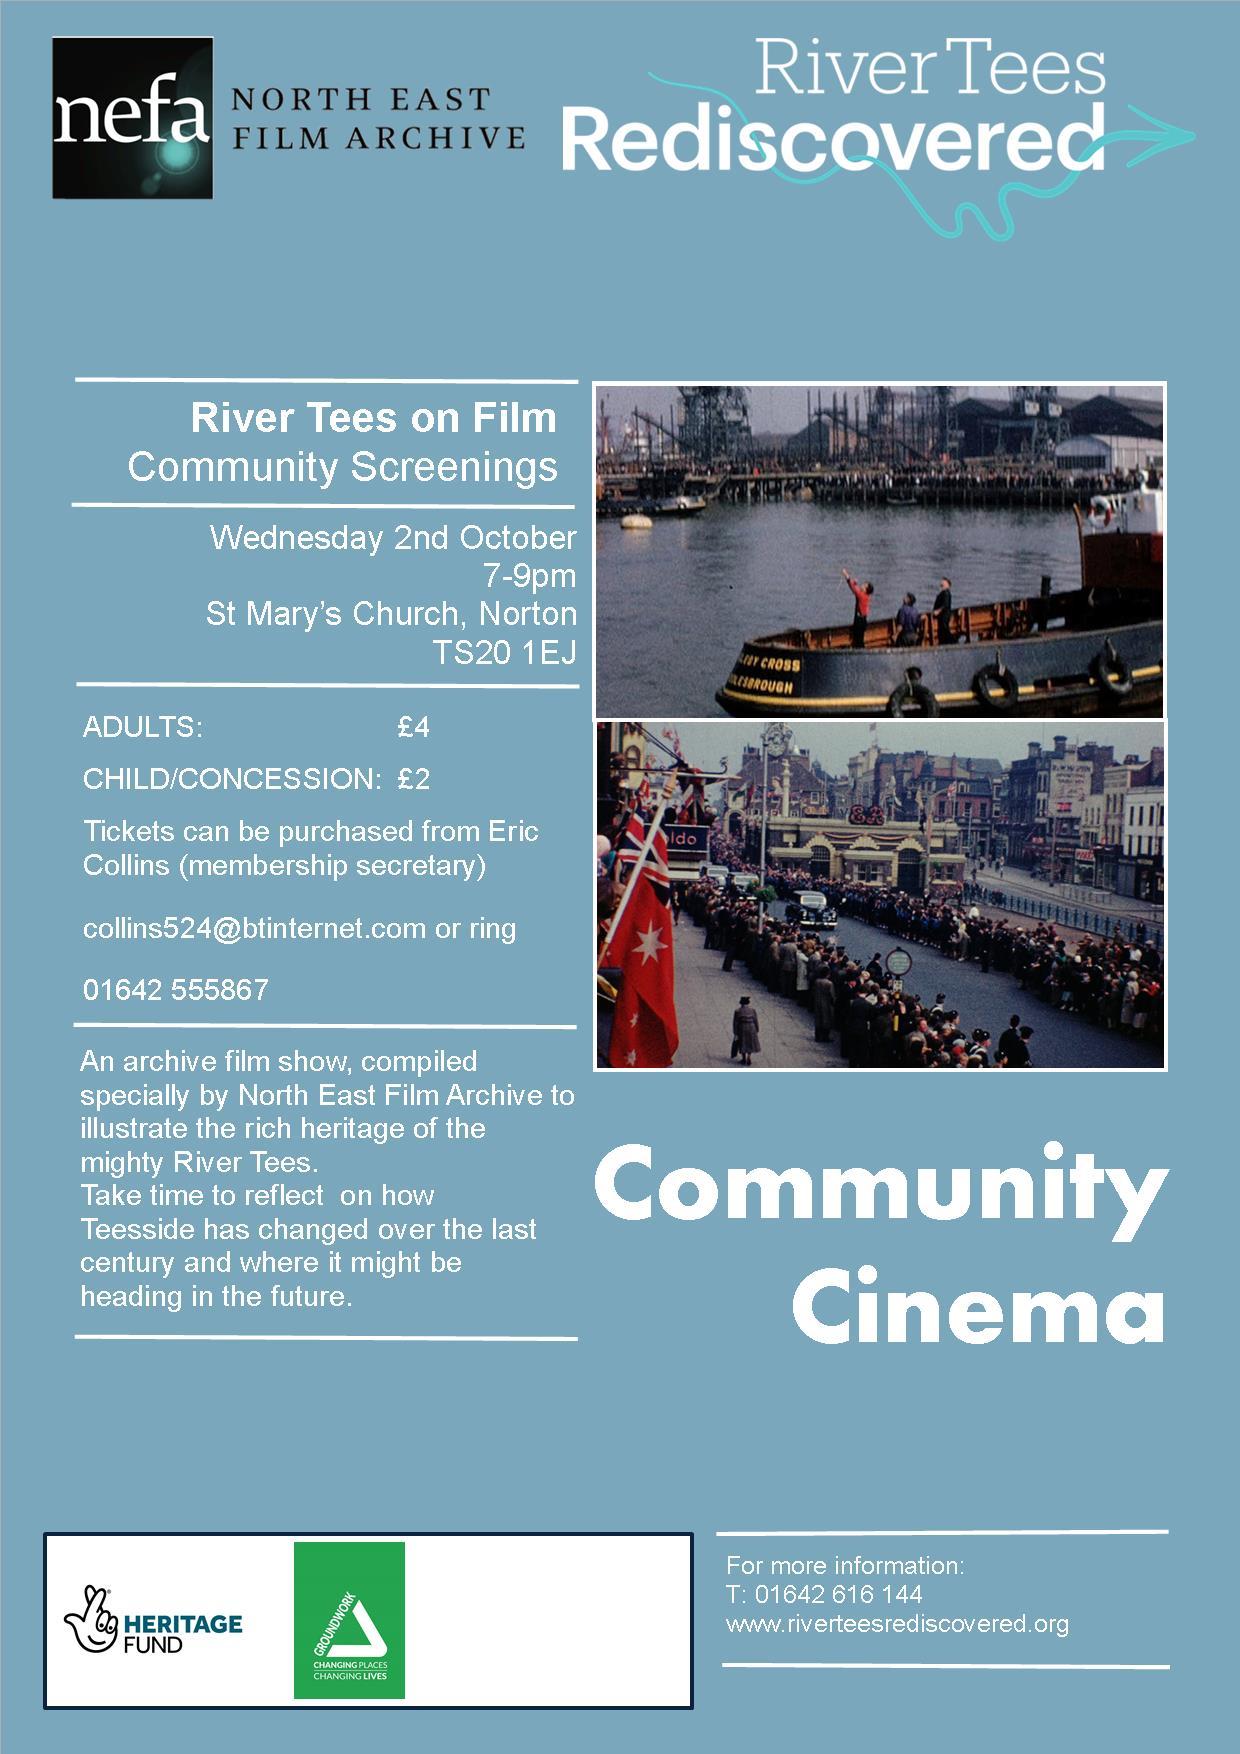 Norton Community Cinema Poster.jpg